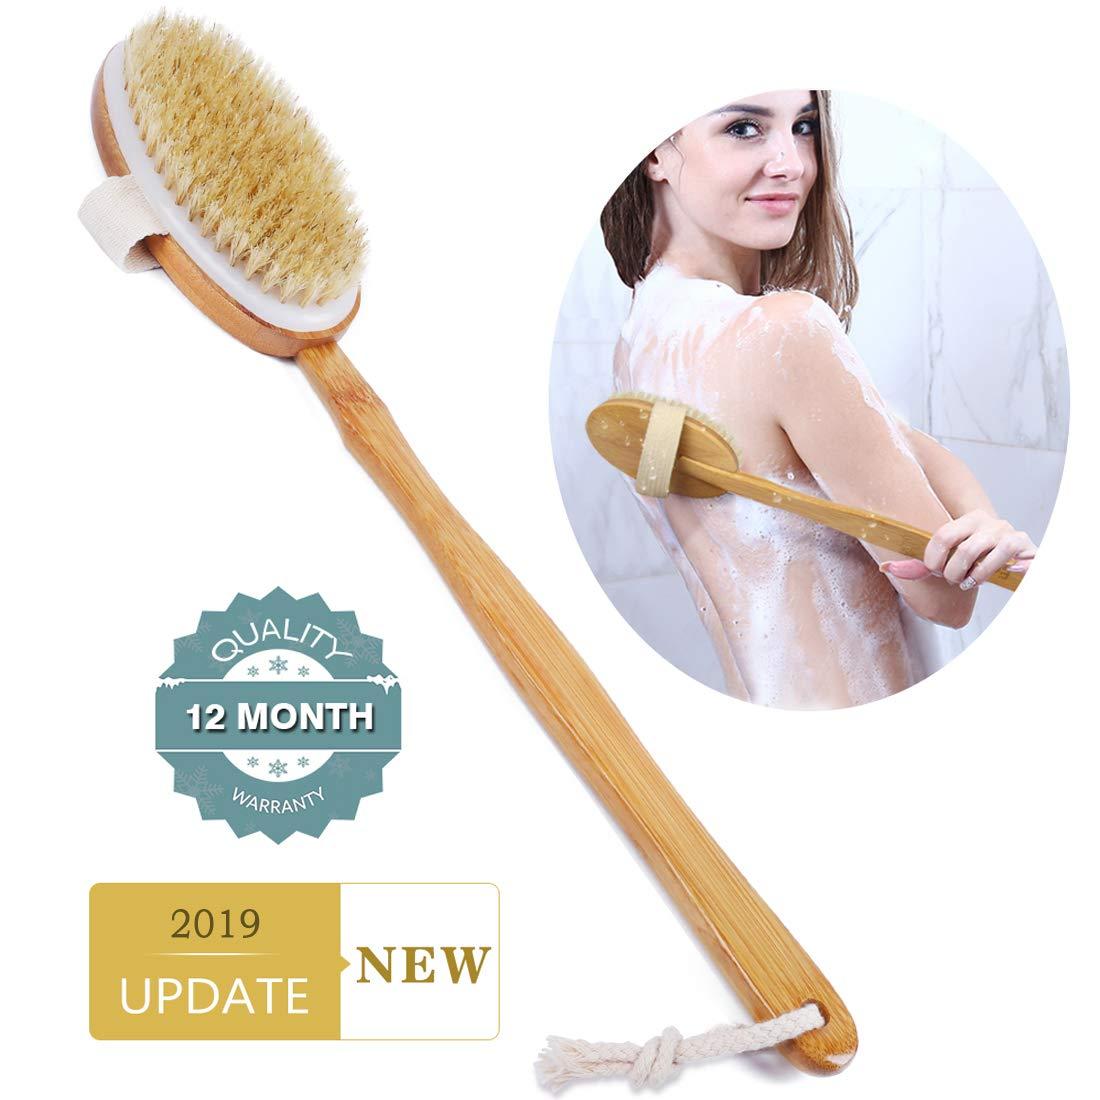 Ybj-ake Shower Back Scrubber